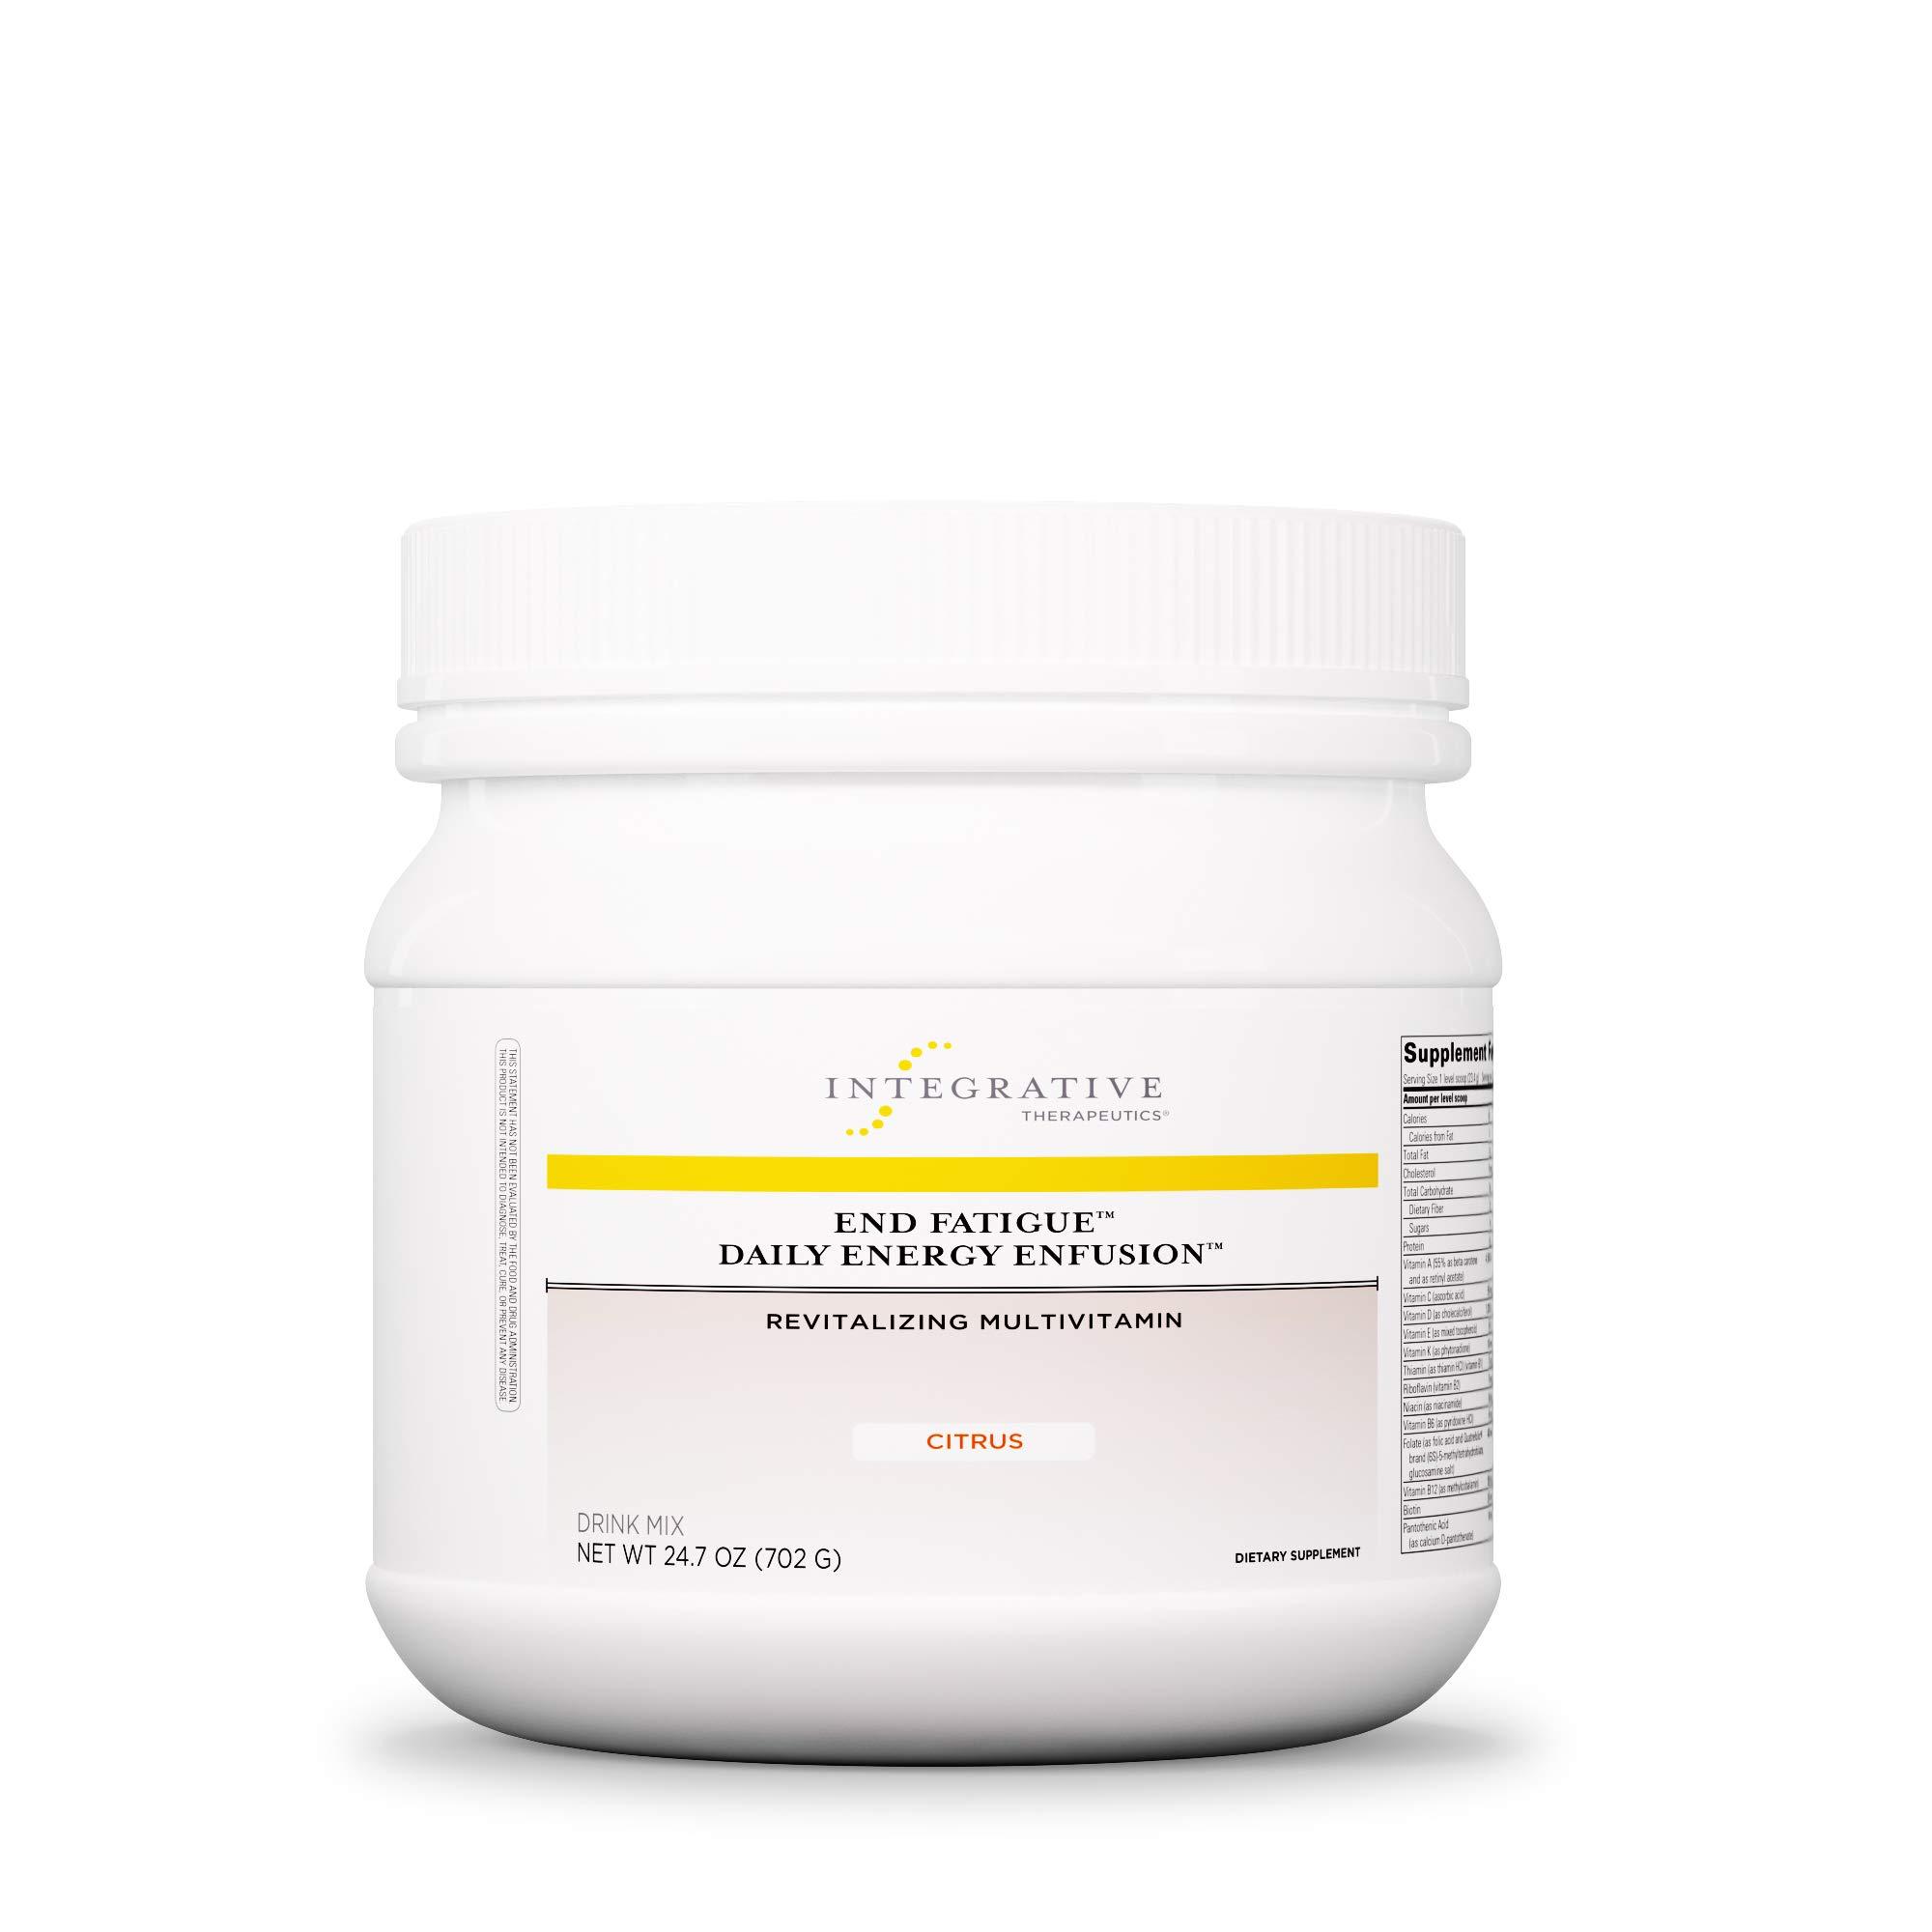 Integrative Therapeutics - End Fatigue Daily Energy Enfusion - Revitalizing Multivitamin - Citrus Flavor - 24.7 Ounce